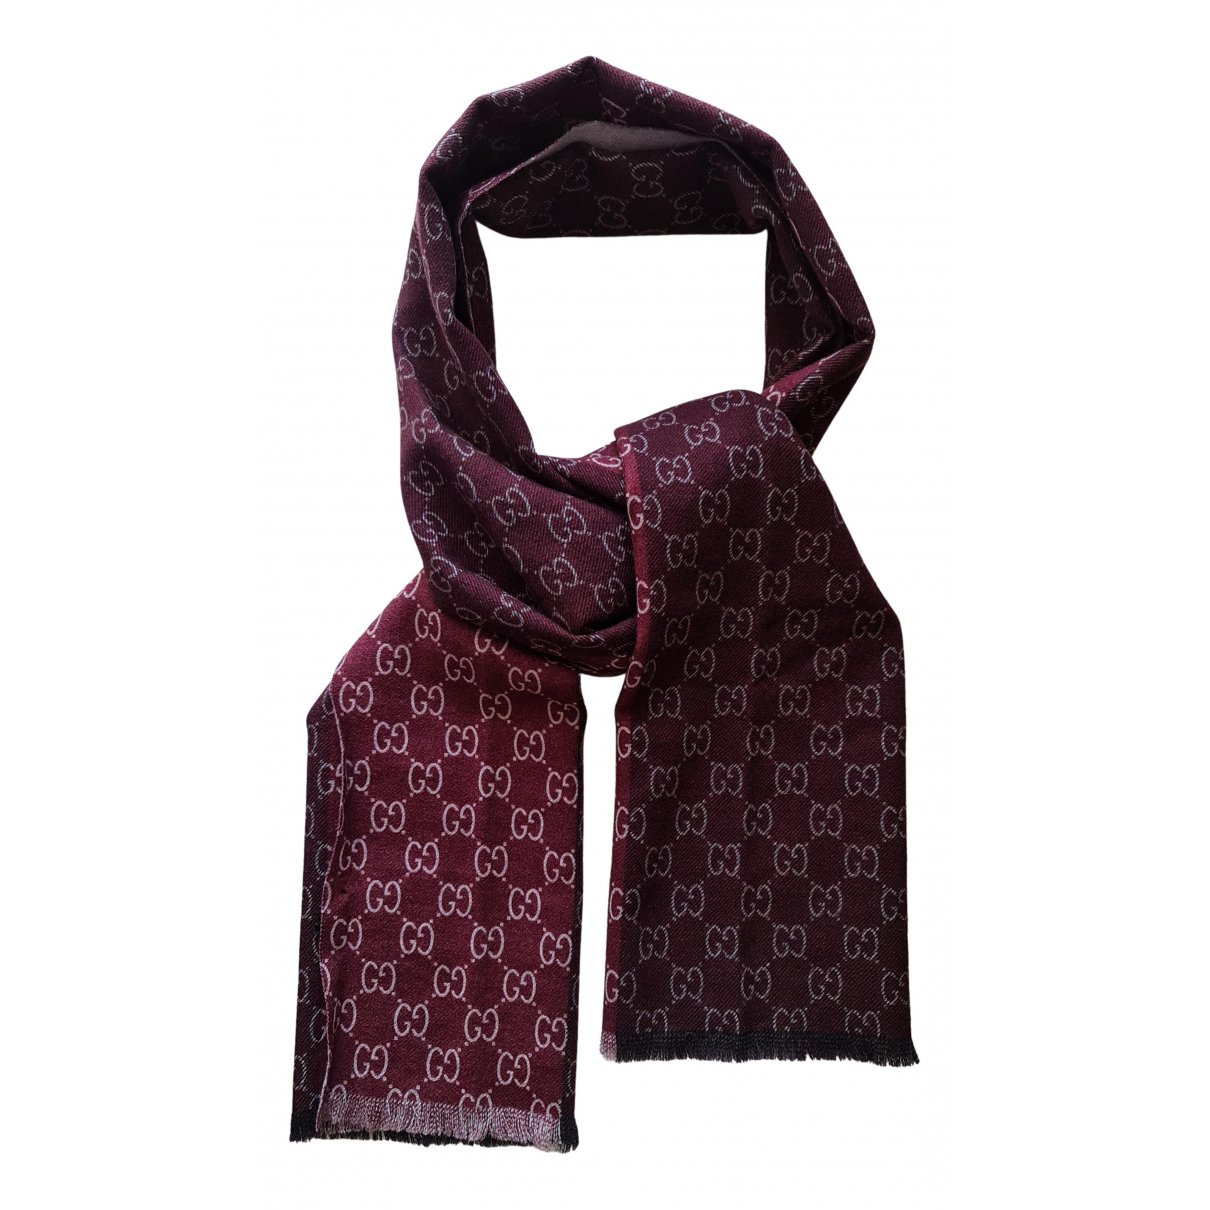 Gucci N Red Wool scarf & pocket squares for Men N